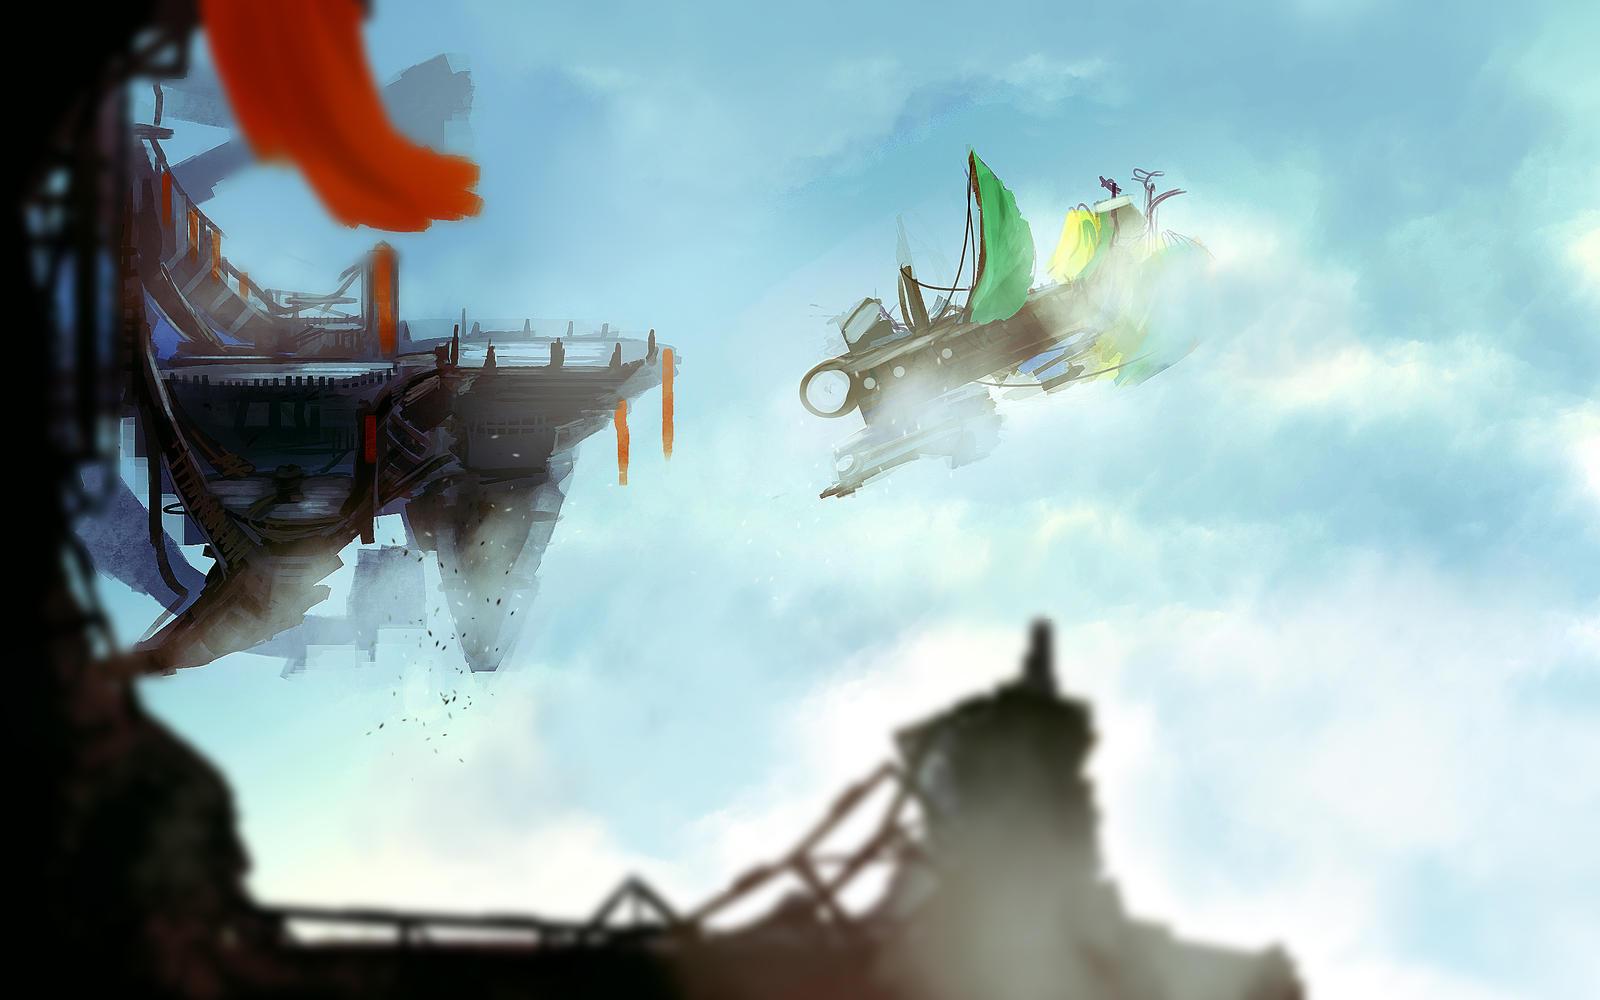 Airship by tenchi24